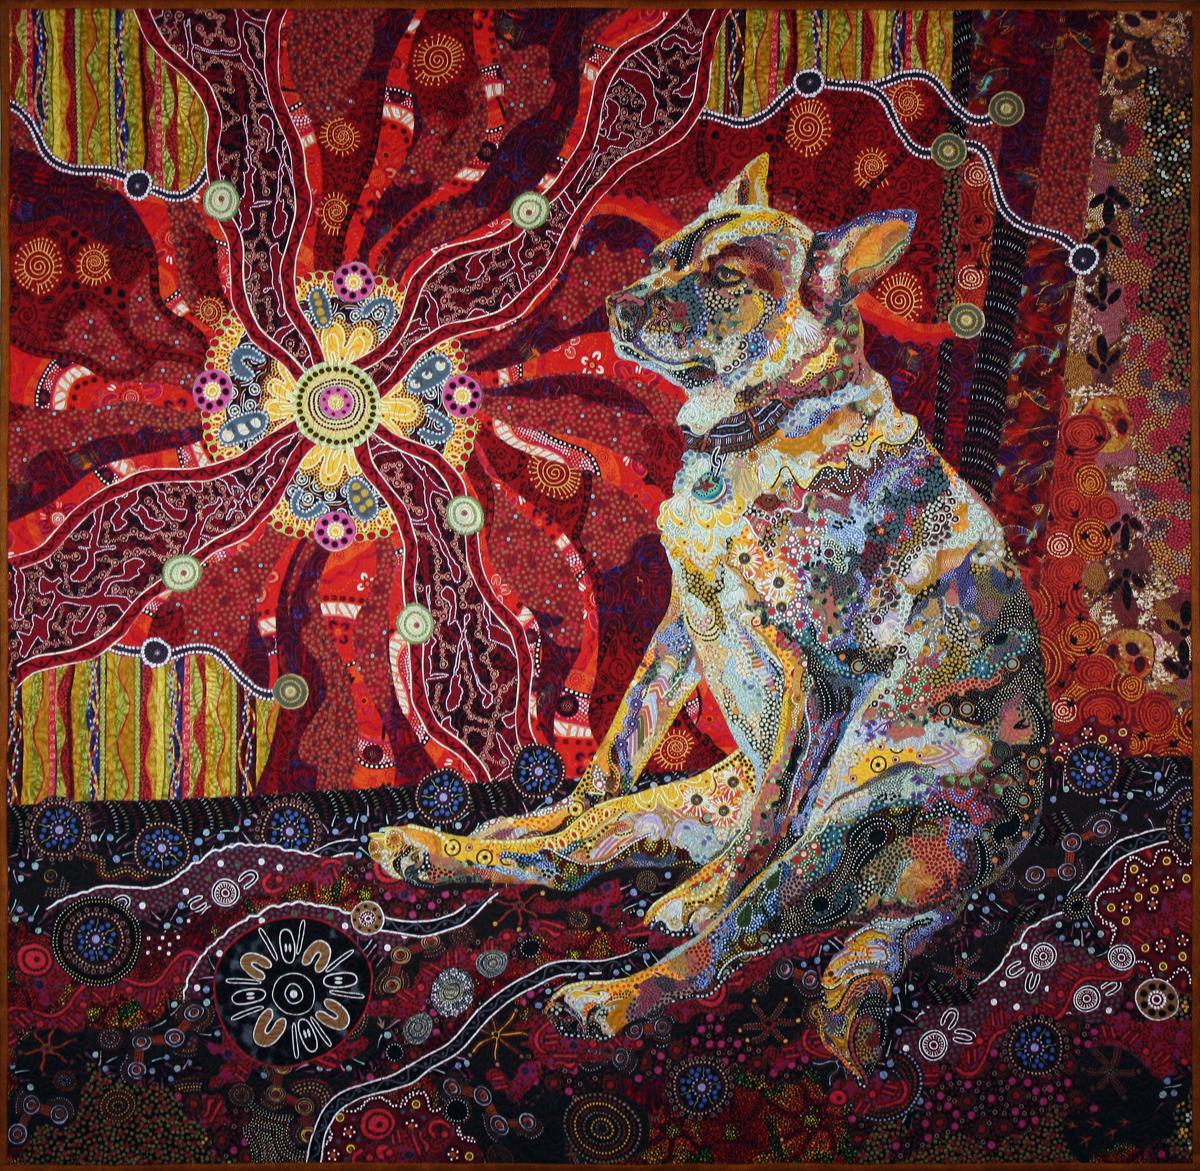 Susan Carlson Quilts : serendipity quilts susan carlson - Adamdwight.com